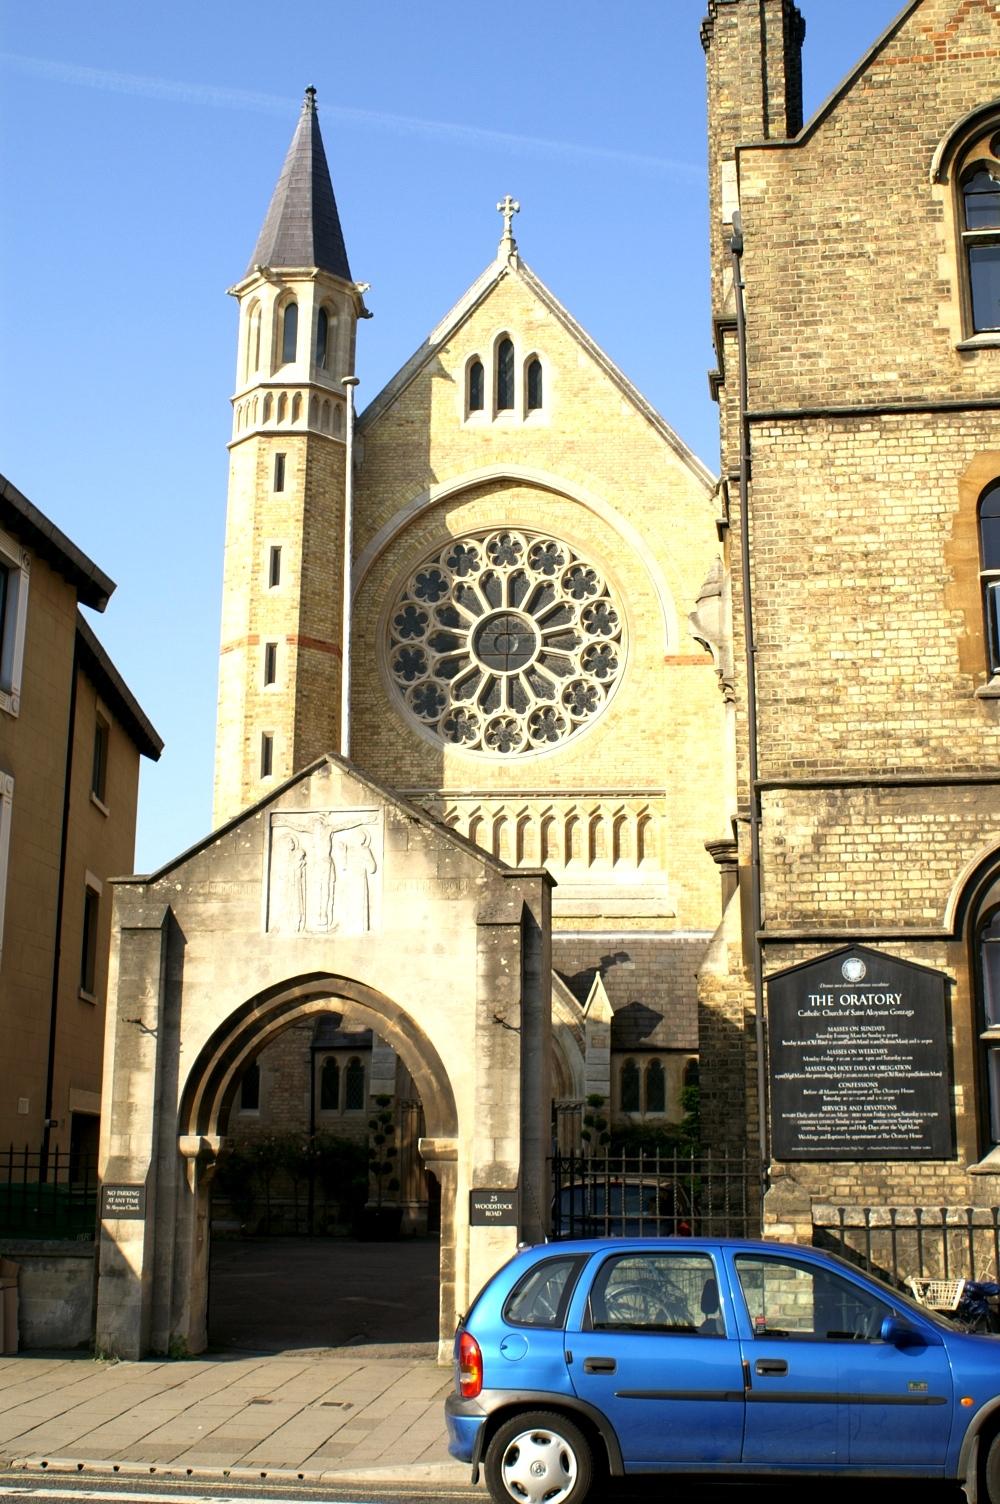 The Oxford Oratory (St Aloysius) (Photo: R Blanch)